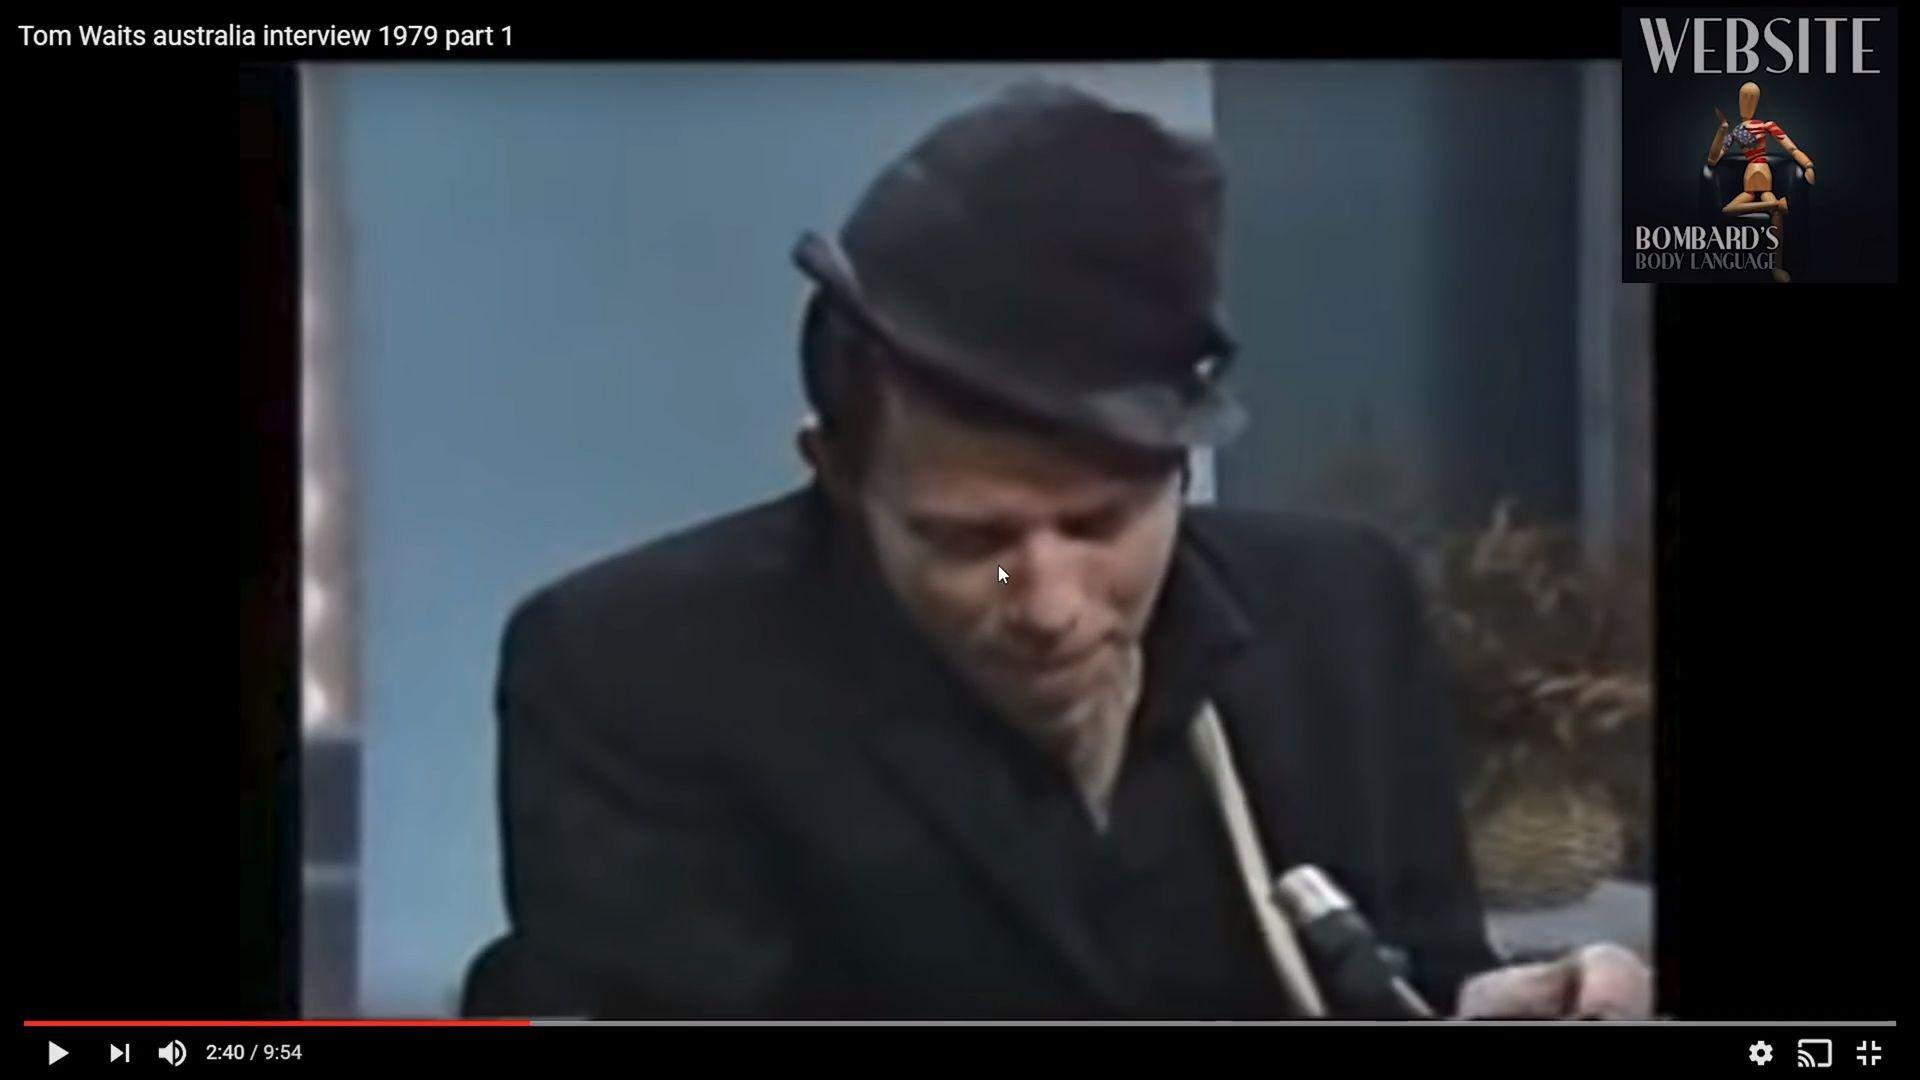 Body Language - Tom Waits - What Anxiety looks like